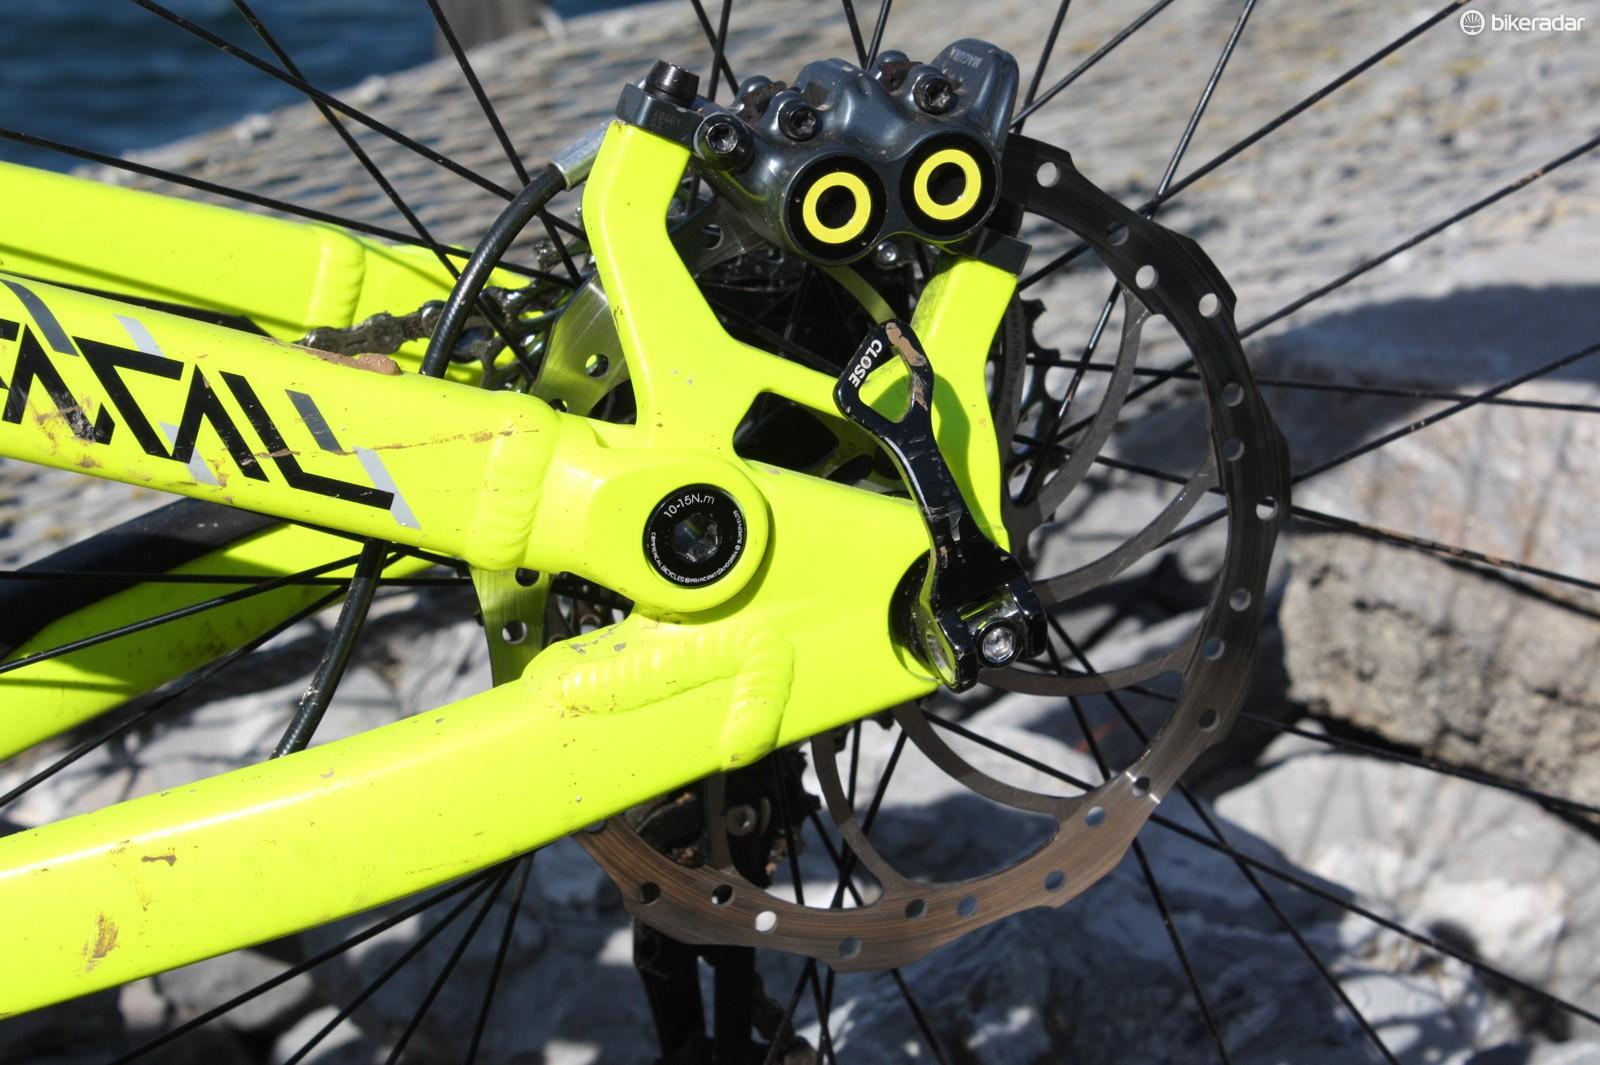 The rear caliper of Magura's new MT7 four-pot hydraulic disc brake